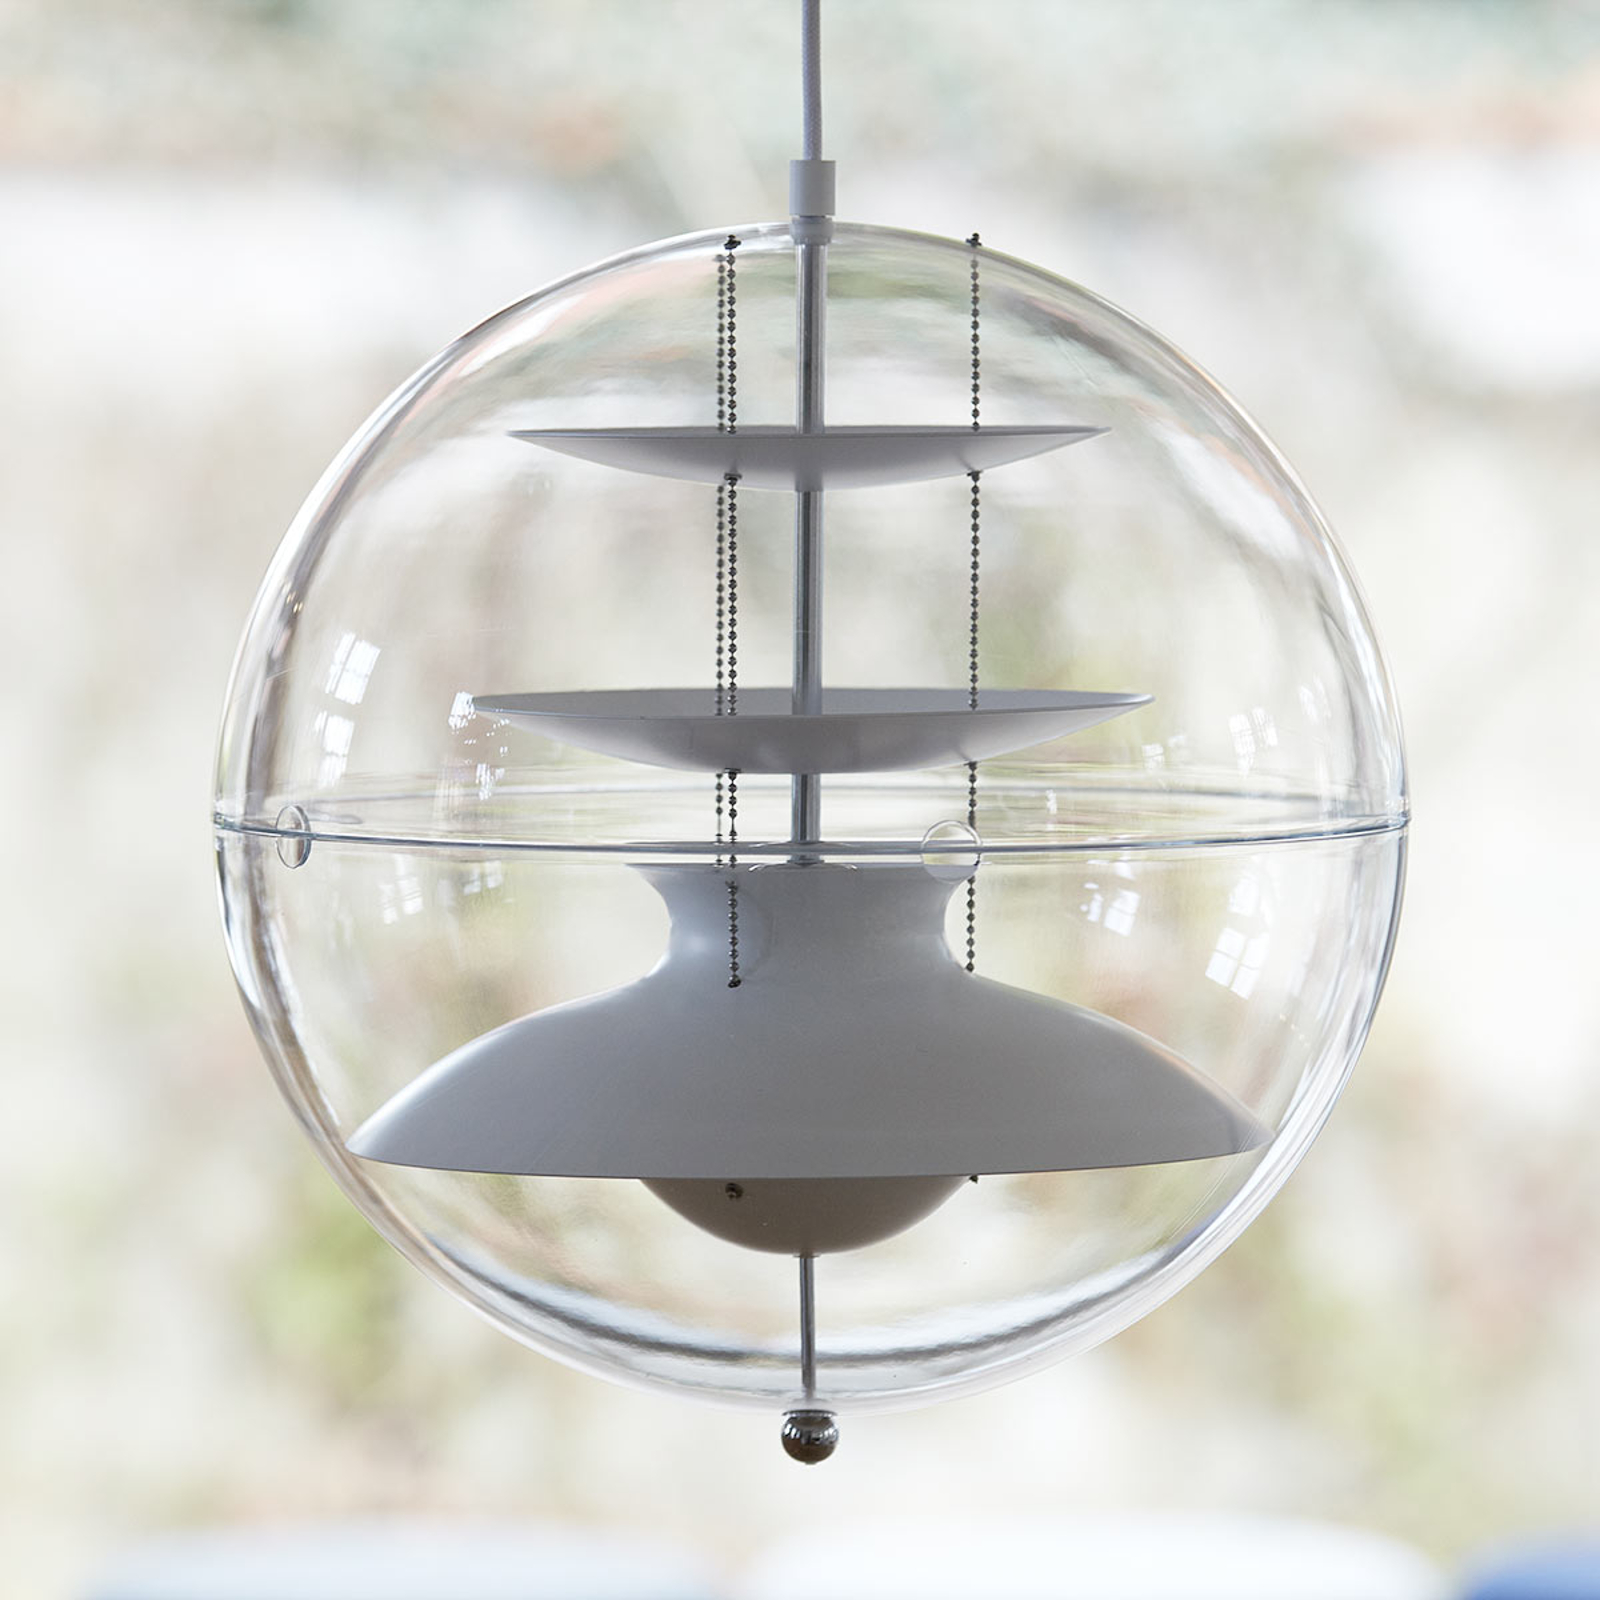 VERPAN Panto lampa wisząca, 40 cm